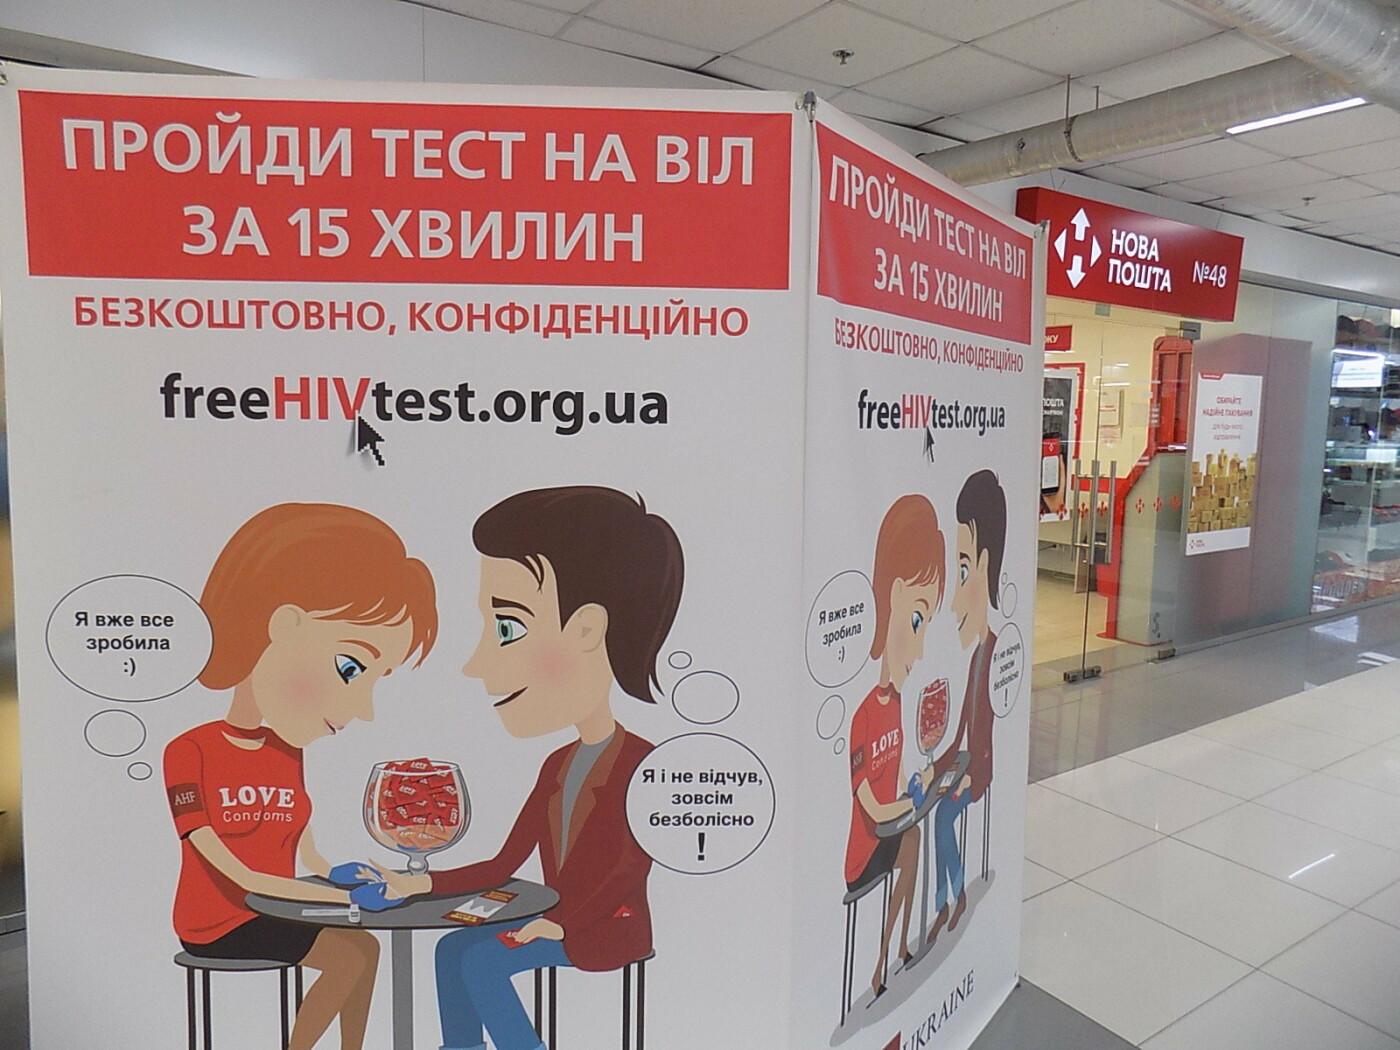 Проверено на себе: в Днепре журналистка 056 прошла экспресс-тест на выявление ВИЧ-инфекций,- ФОТО, фото-1